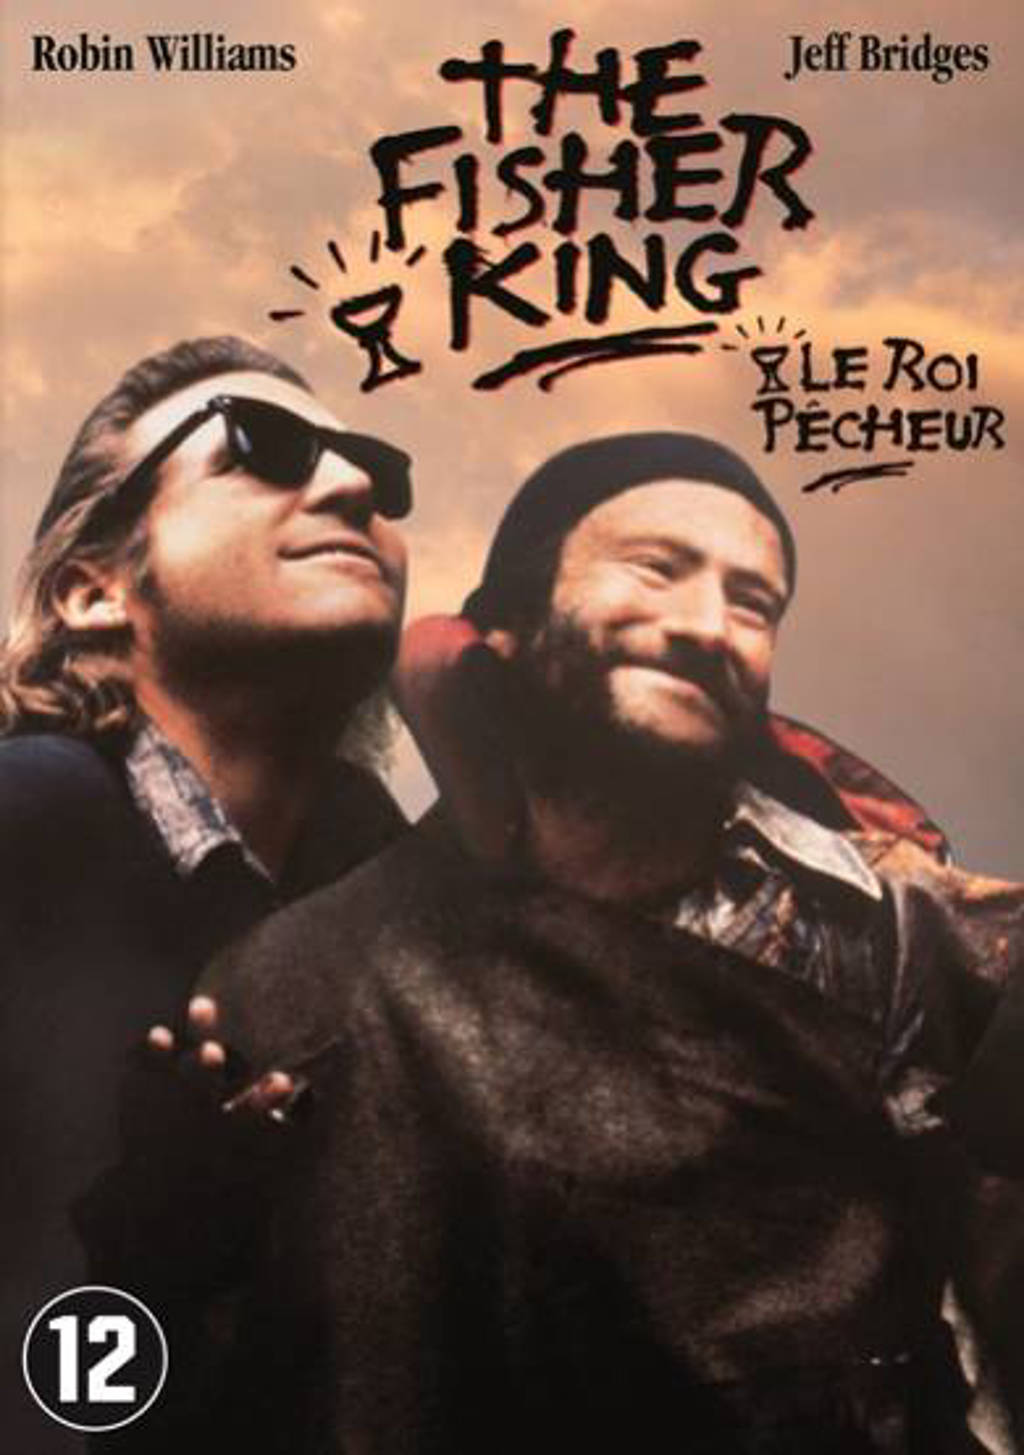 Fisher king (DVD)